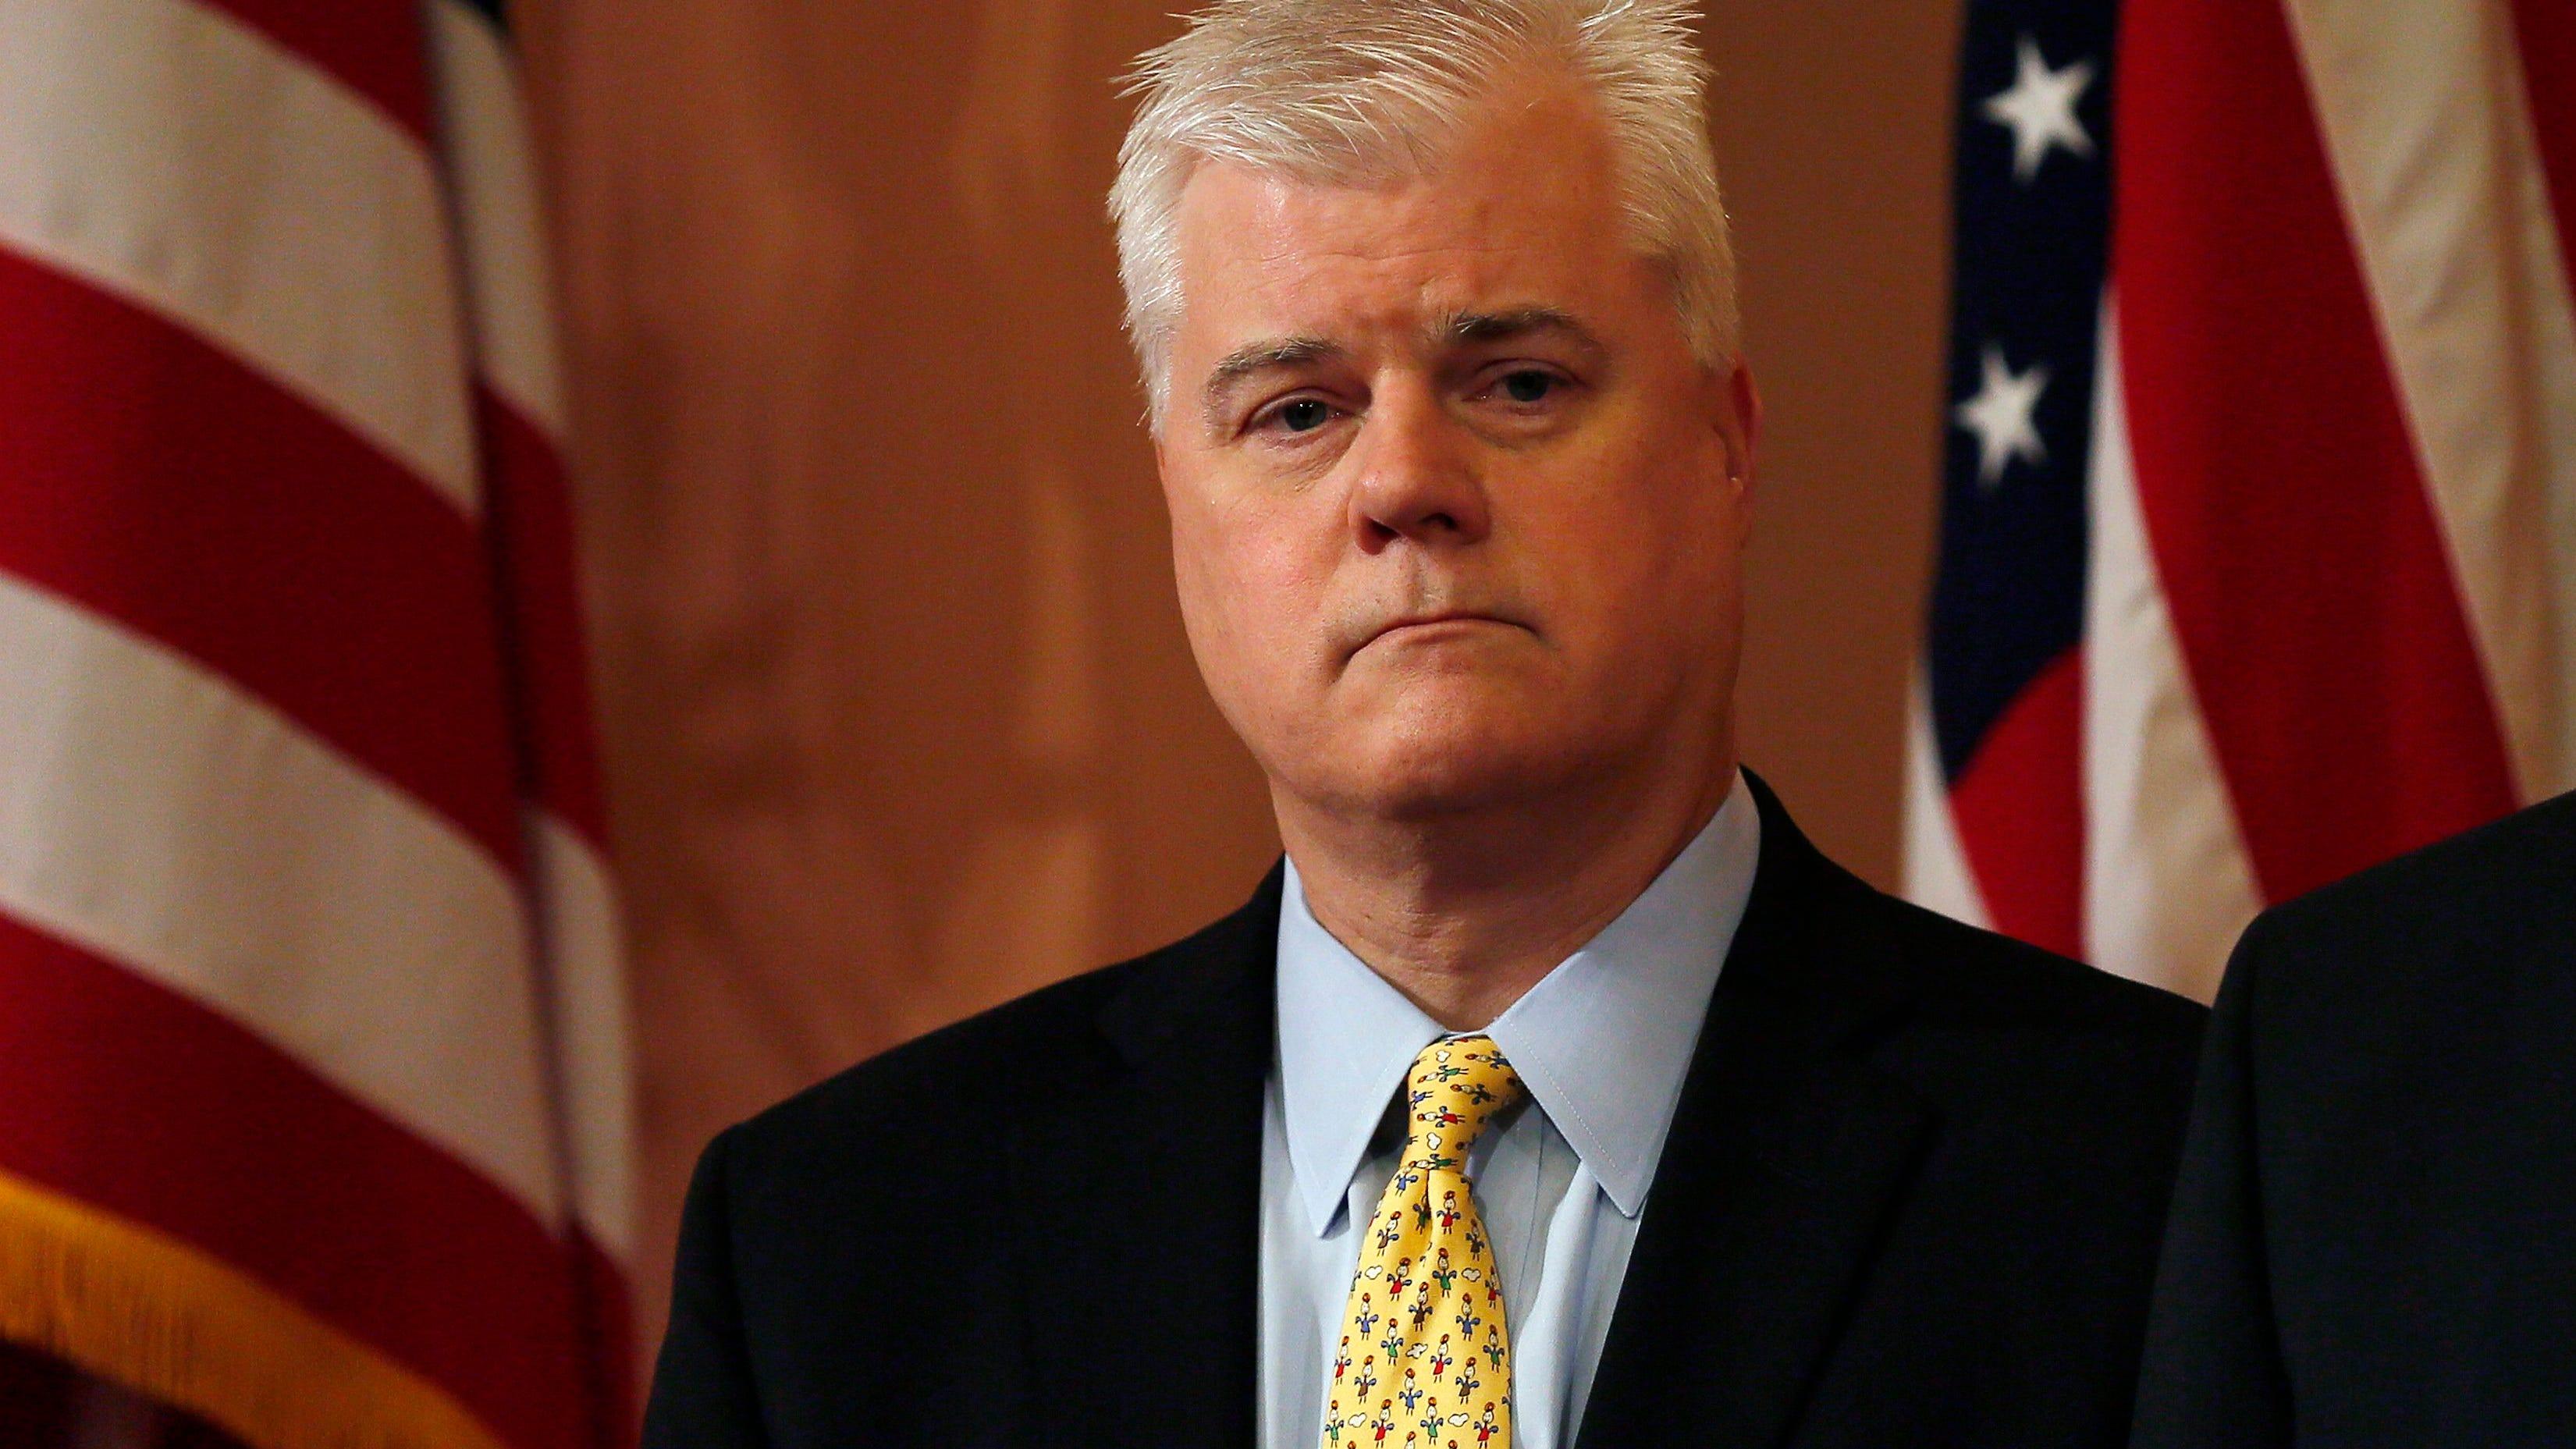 DeWine's legislative director with past FirstEnergy ties resigns